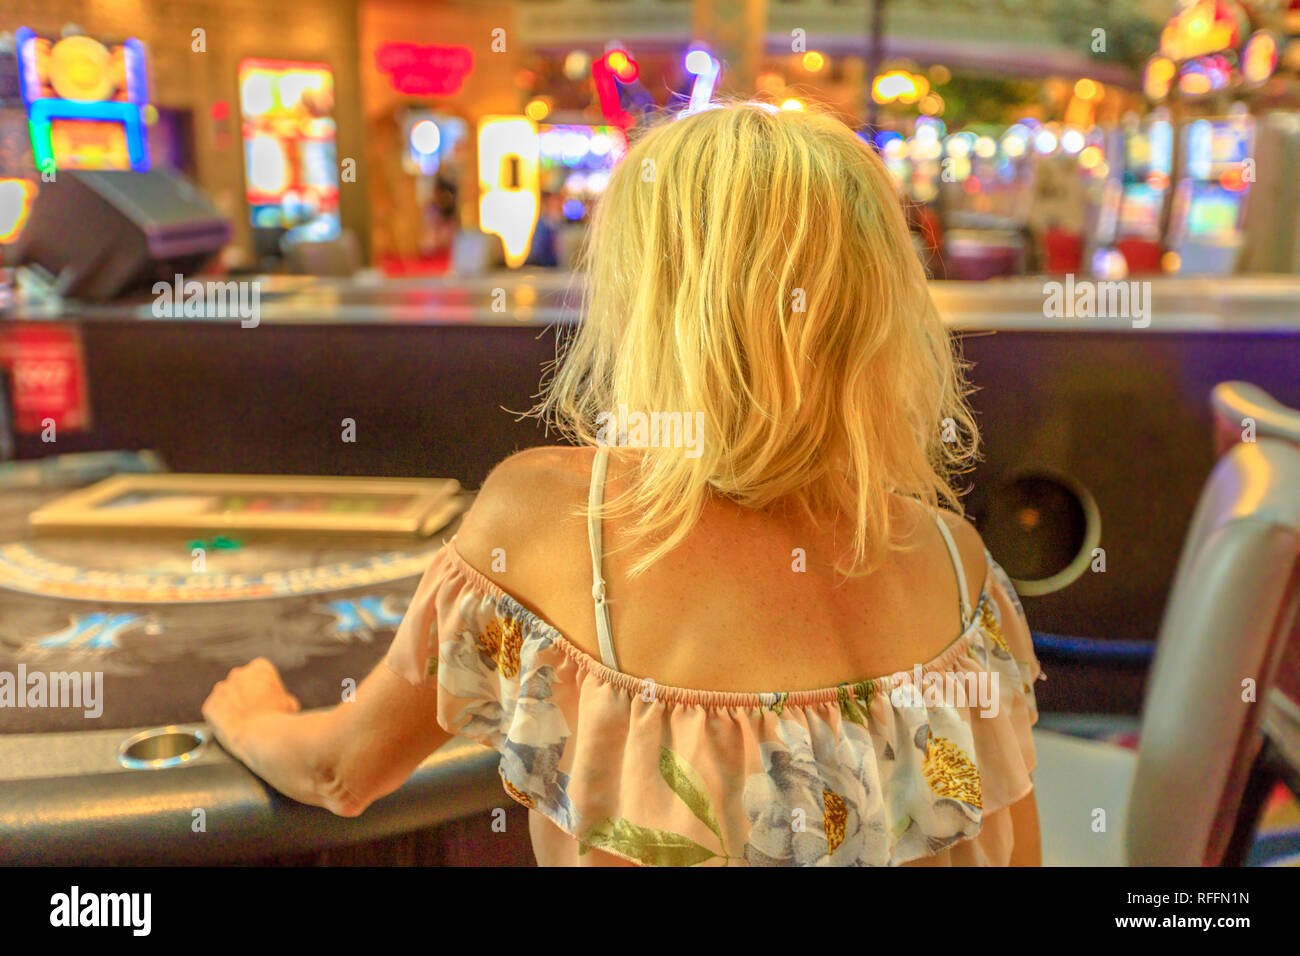 Caucasian blonde woman gambling in casino sitting at blackjack table. Gambler addict concept. Lifestyle girl play in casino at Las Vegas, Nevada - Stock Image